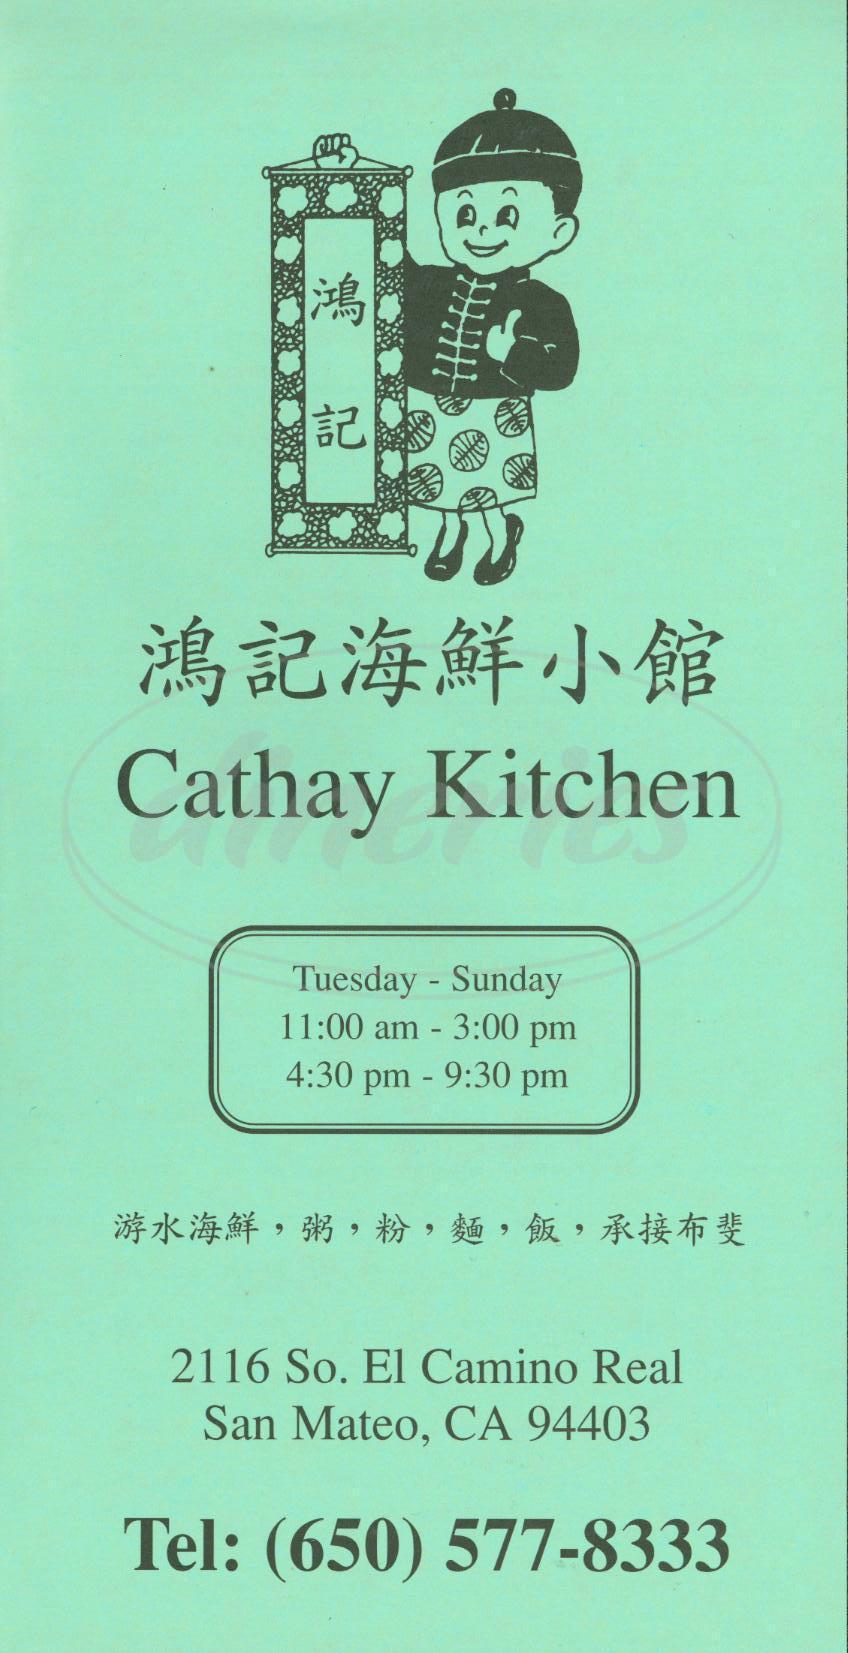 Cathay Kitchen Menu - San Mateo - Dineries